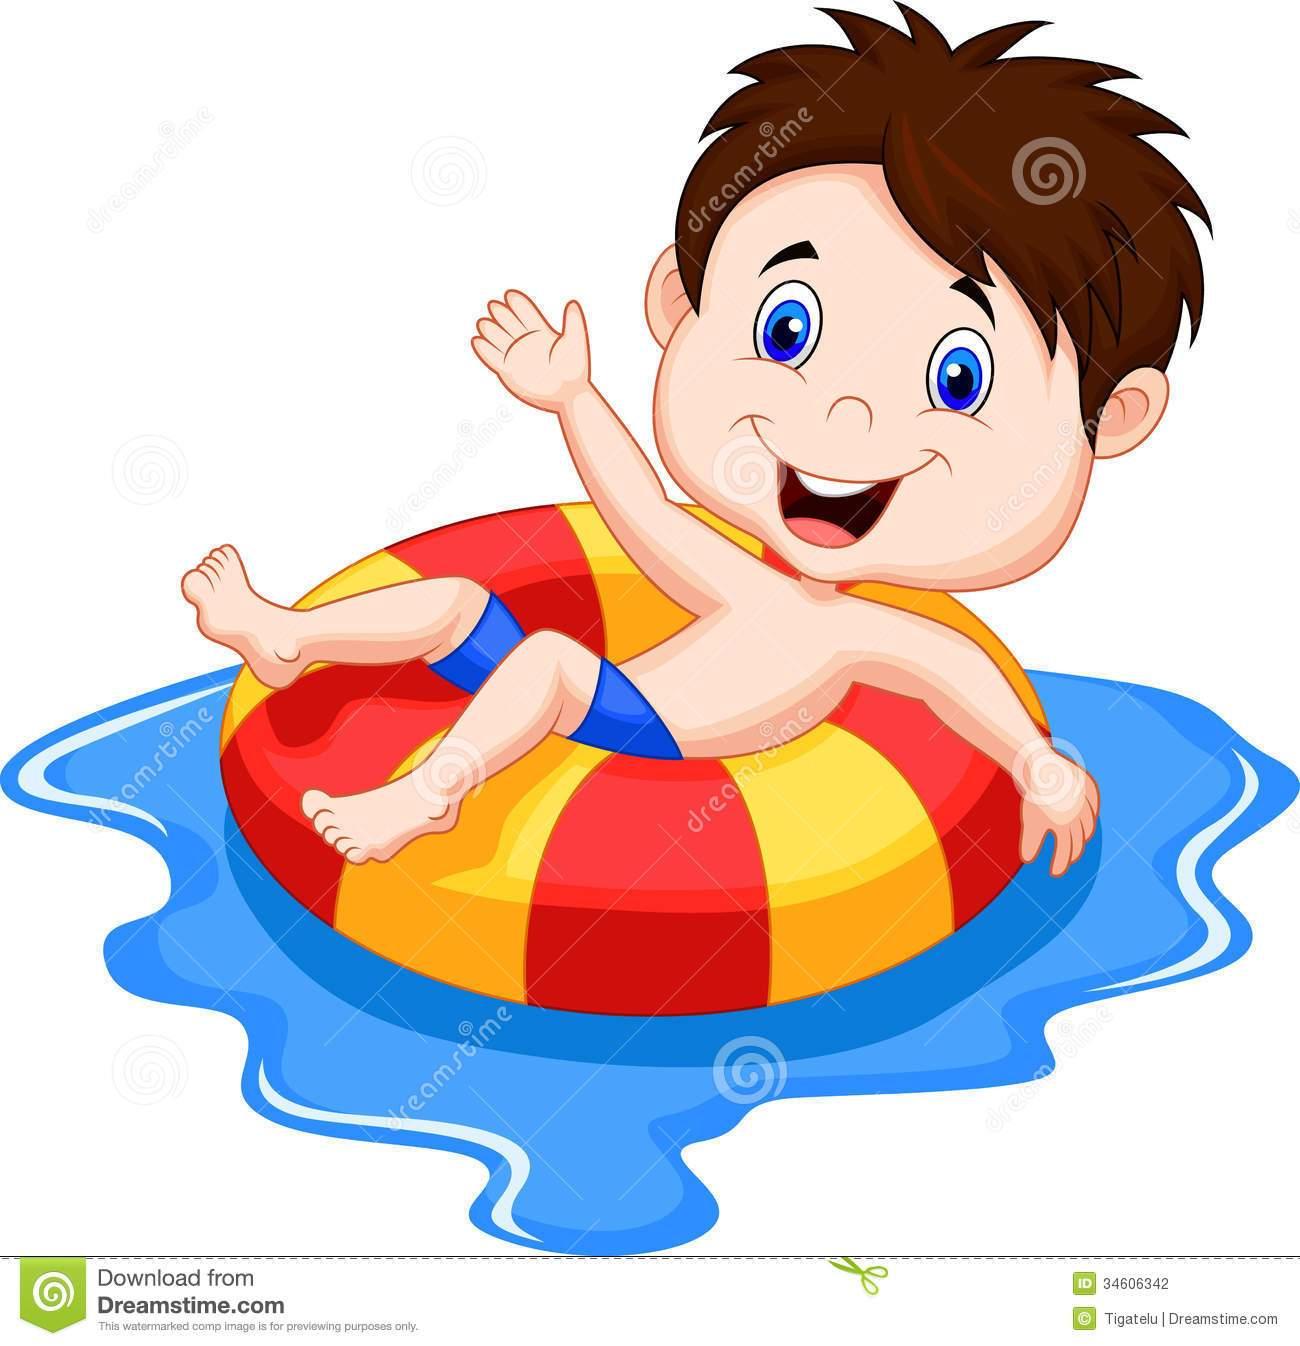 Kids swim clipart transparent download Swimming clipart for kids 3 » Clipart Portal transparent download